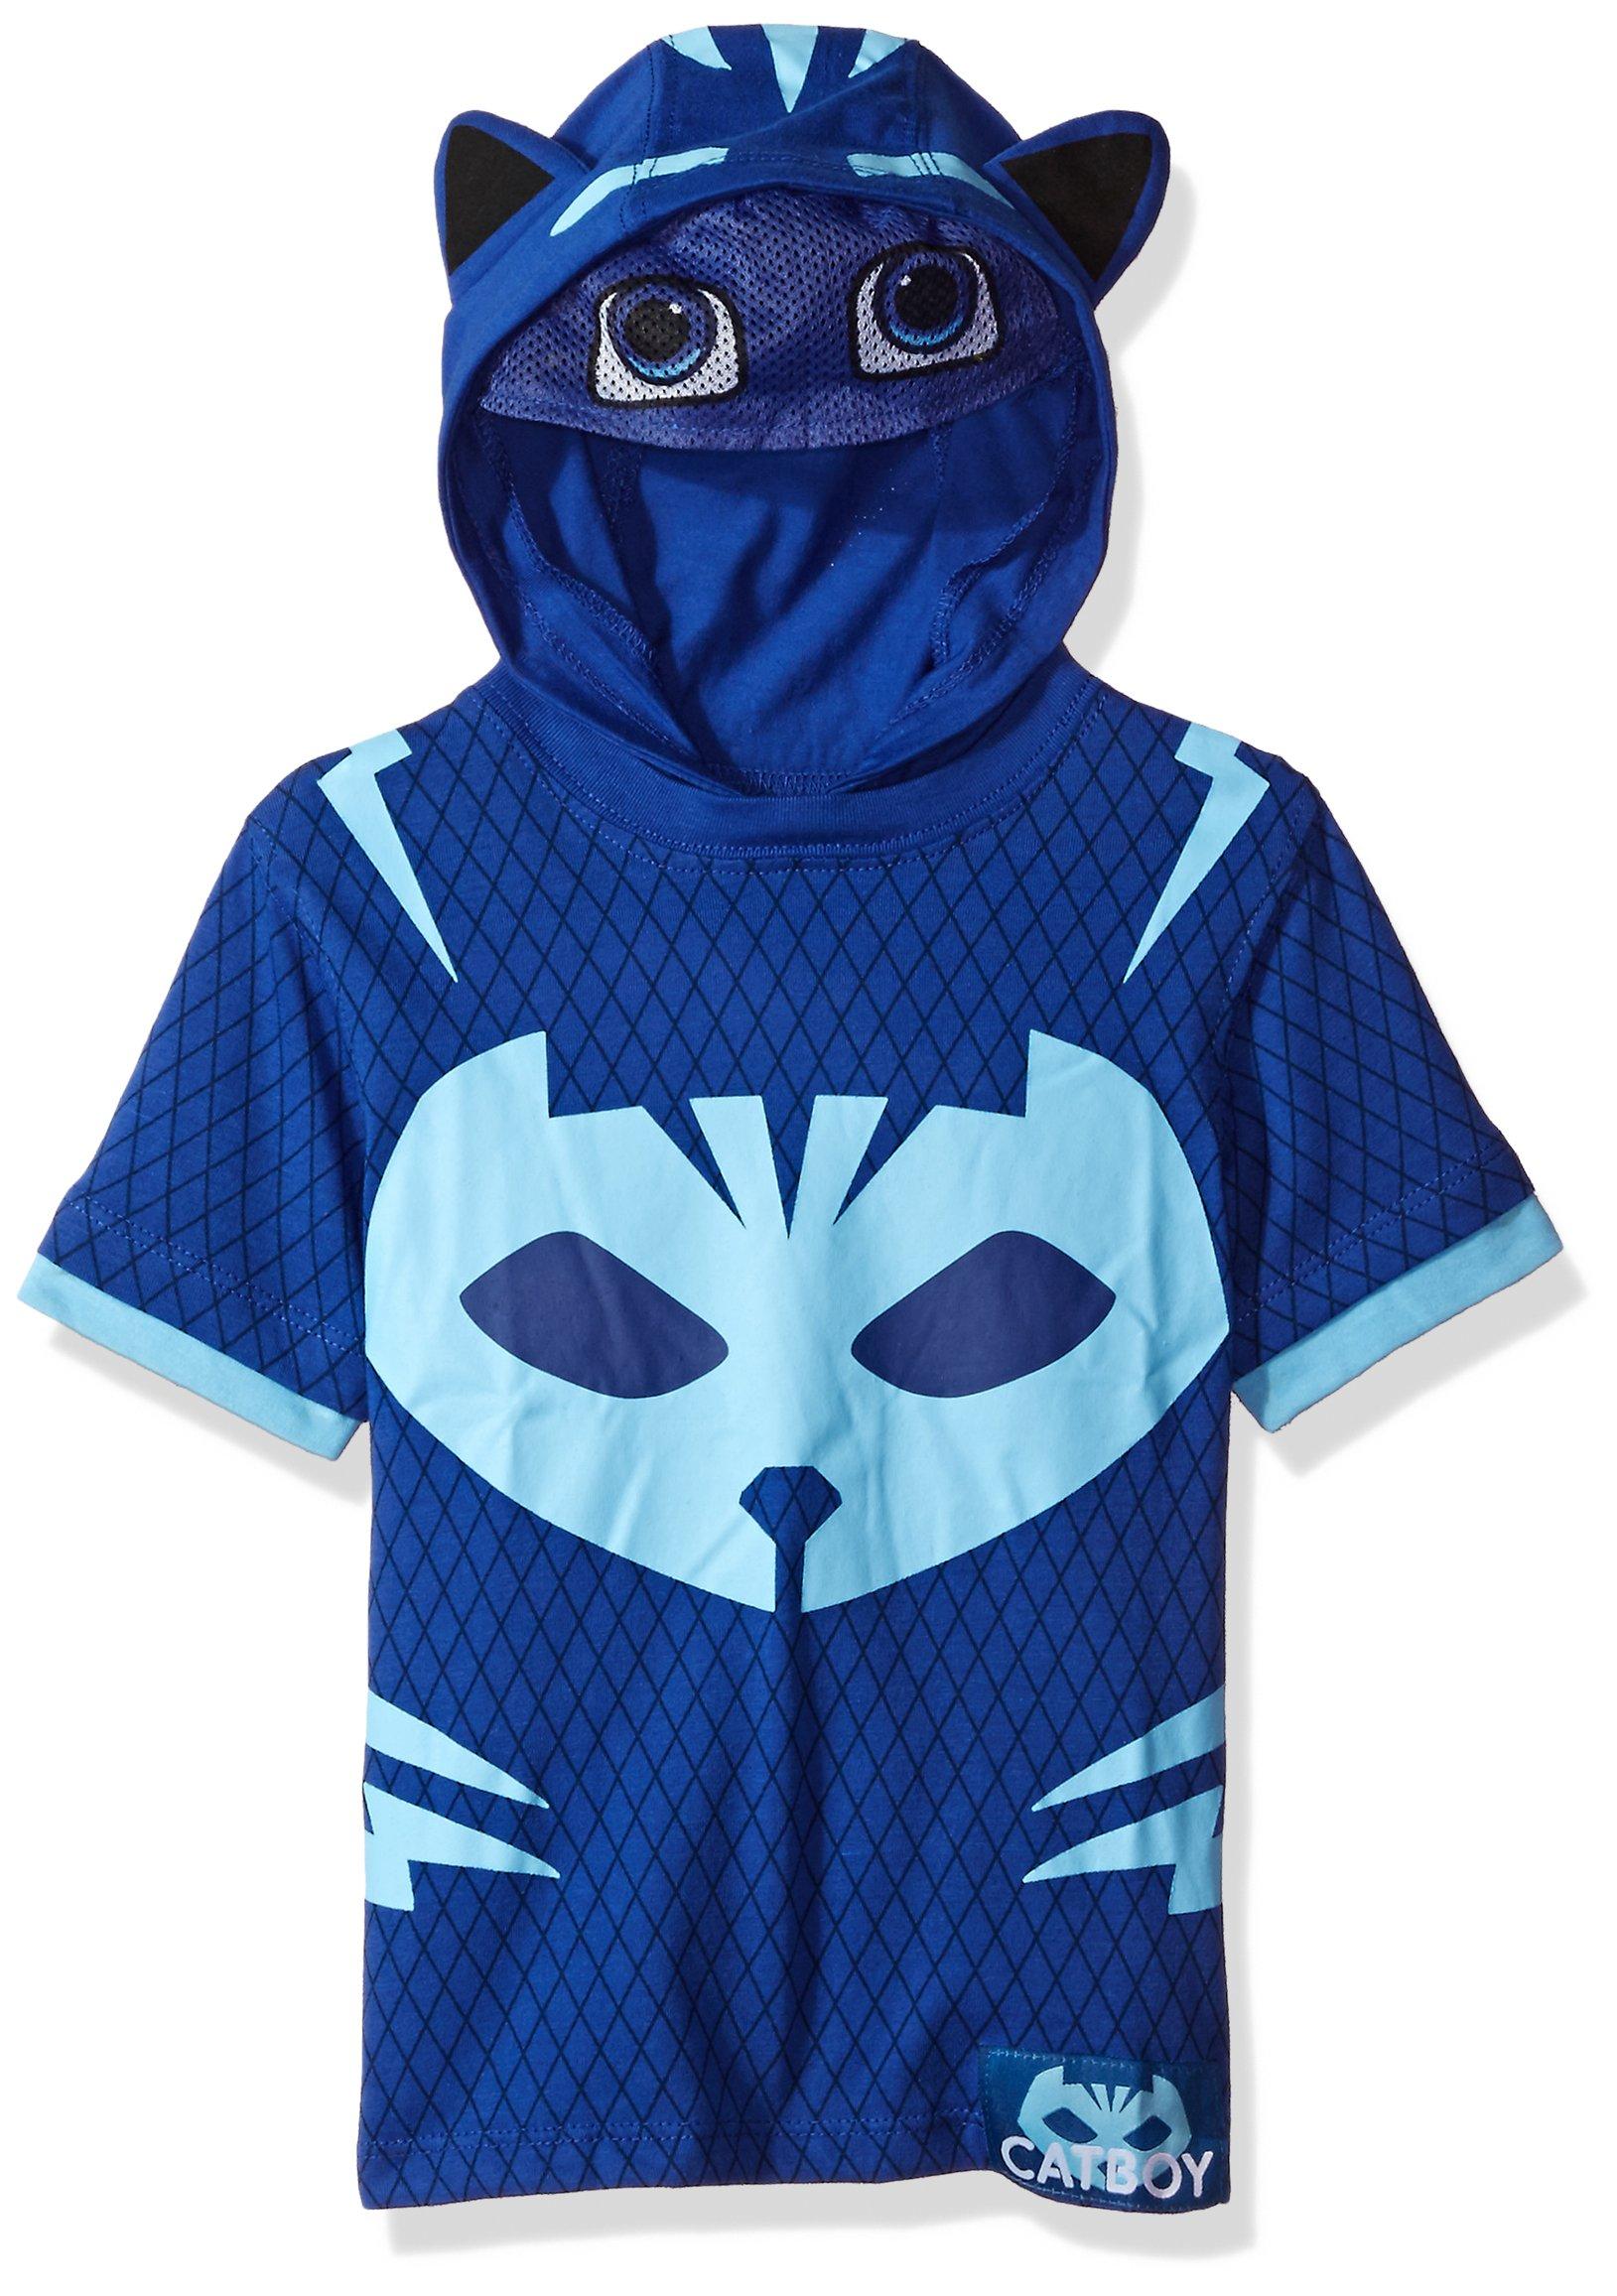 PJMASKS Toddler Boys' Gekko and Catboy Hoodie, Blue Short Sleeve, 3T